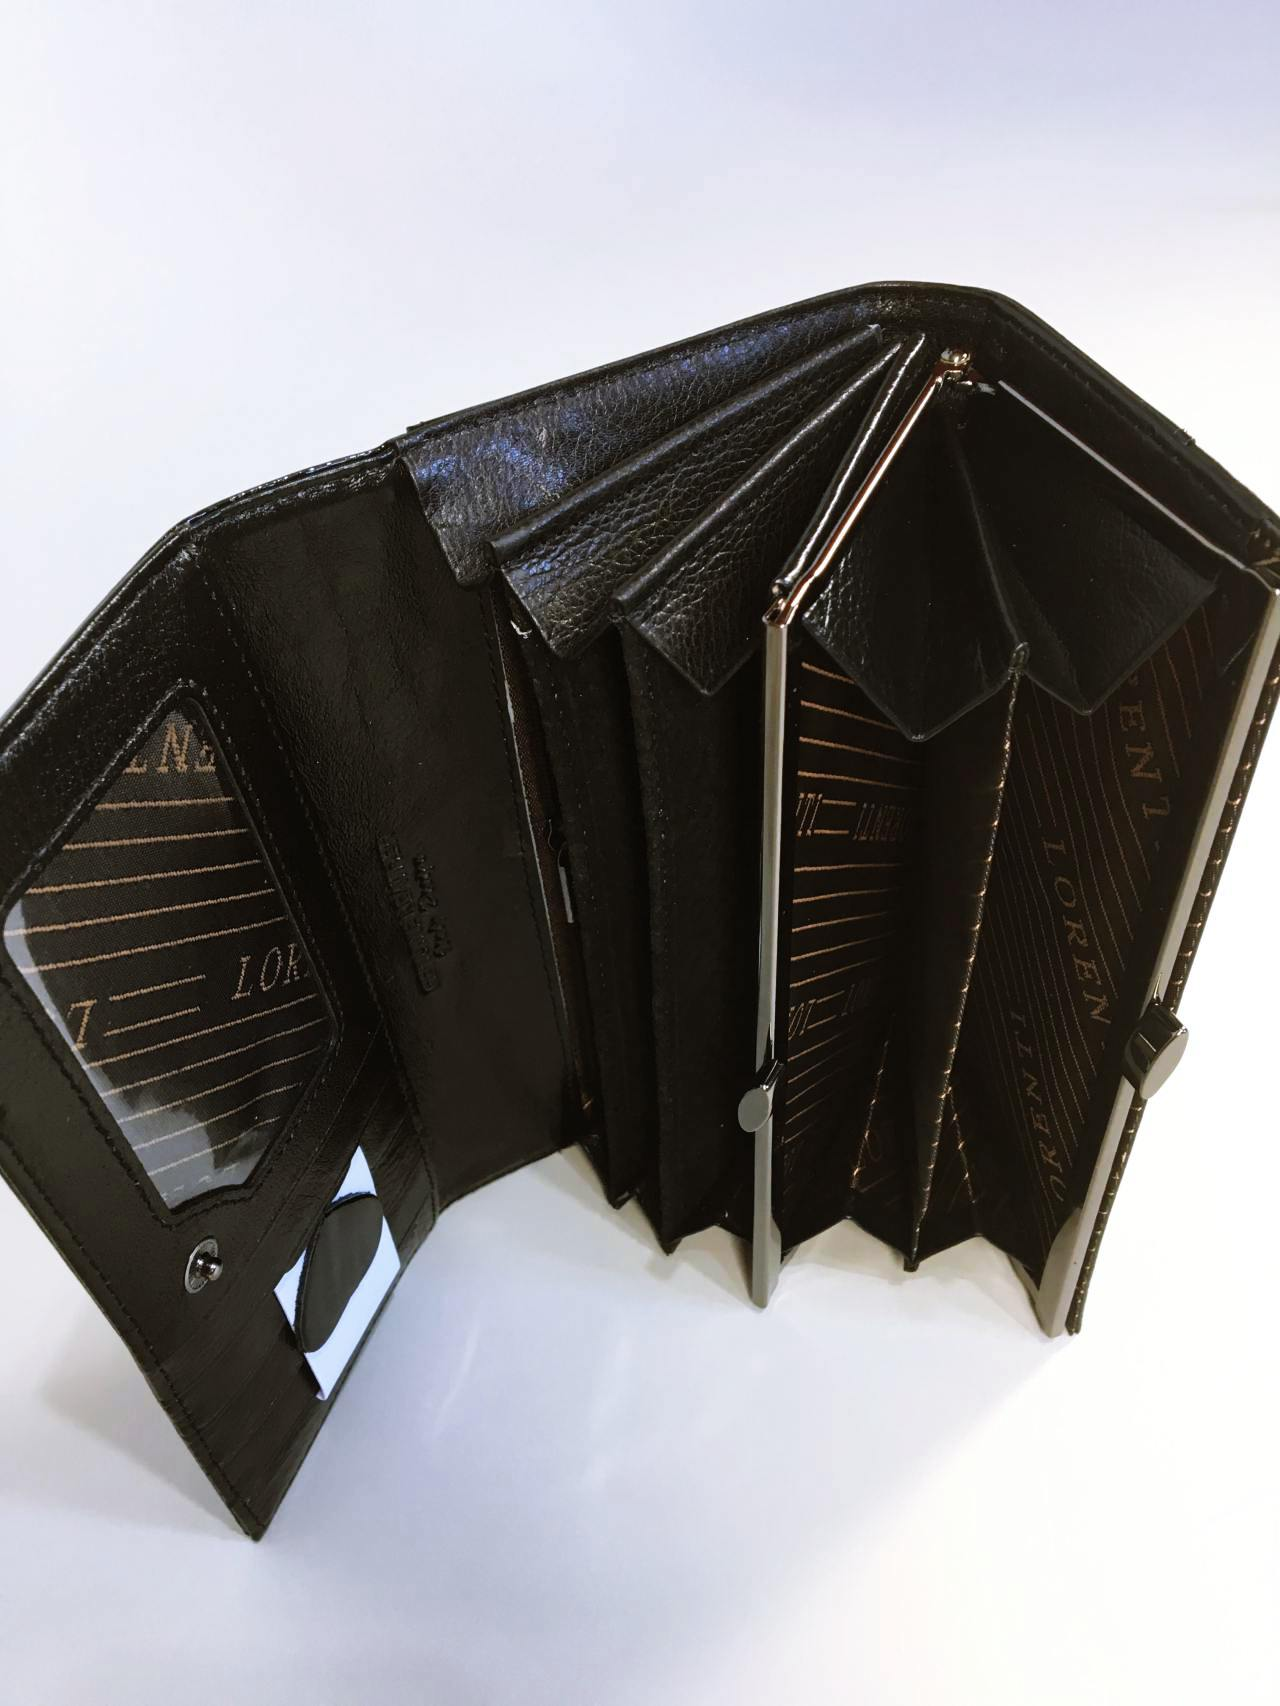 Kožená peněženka Lorenti černo šedá lesklá 04